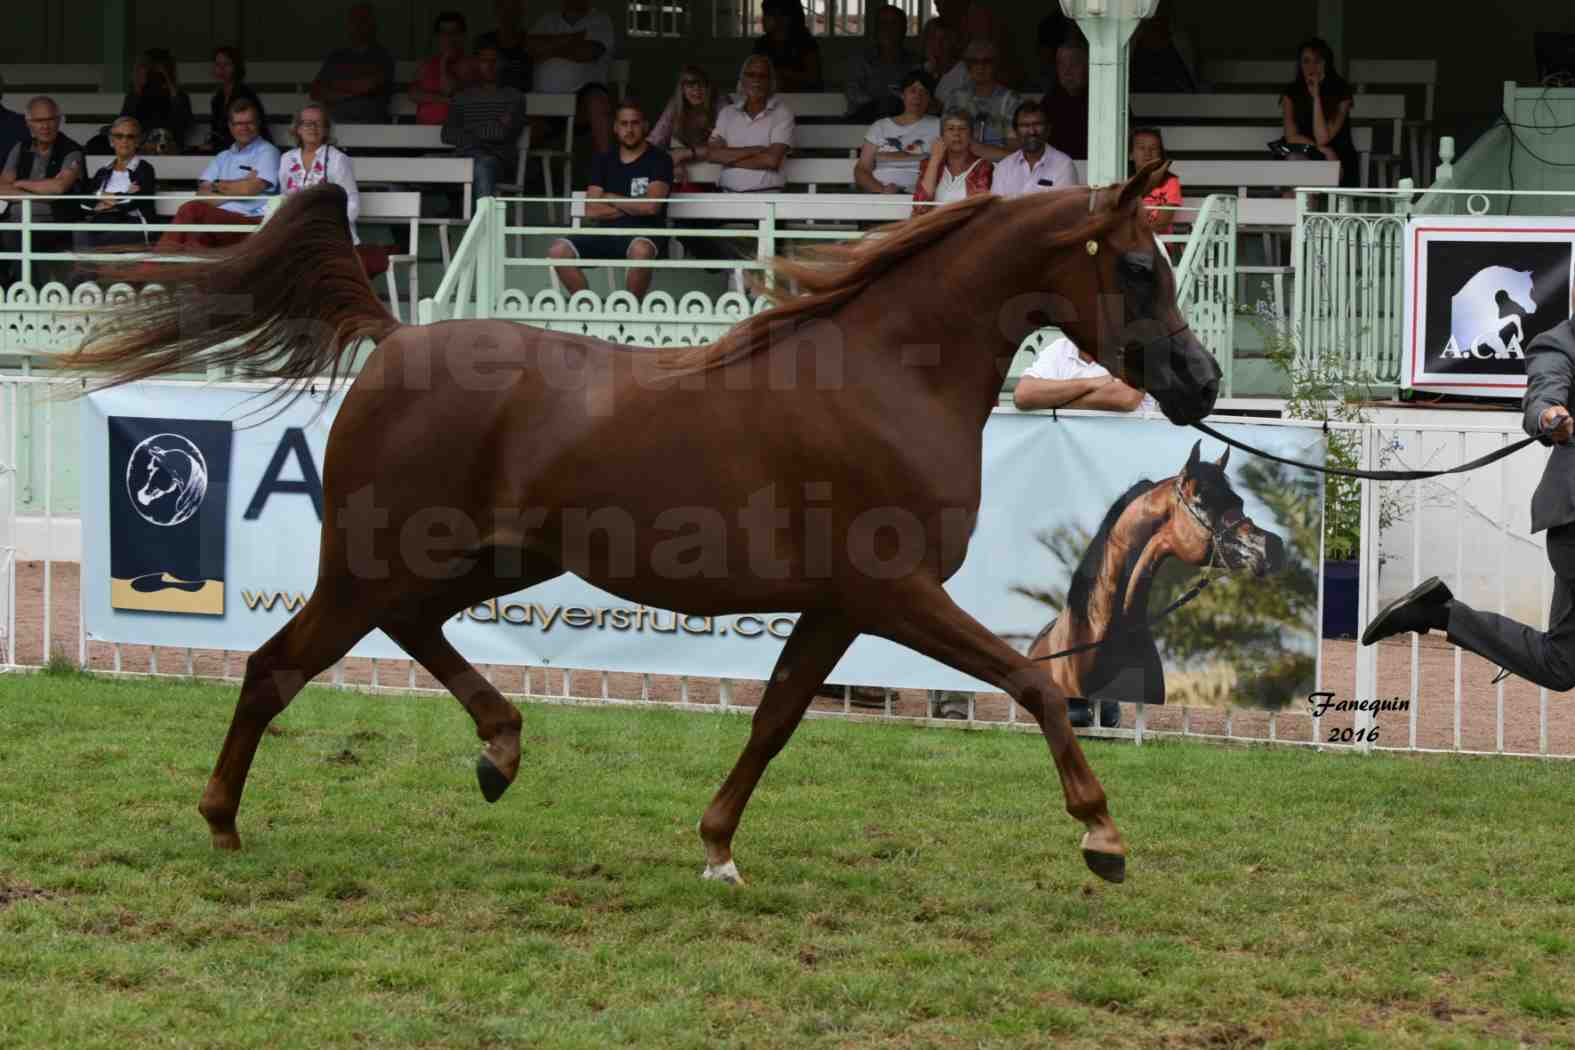 International Arabian Horse Show B de VICHY 2016 - PEARL DE DJOON - Notre Sélection - 07